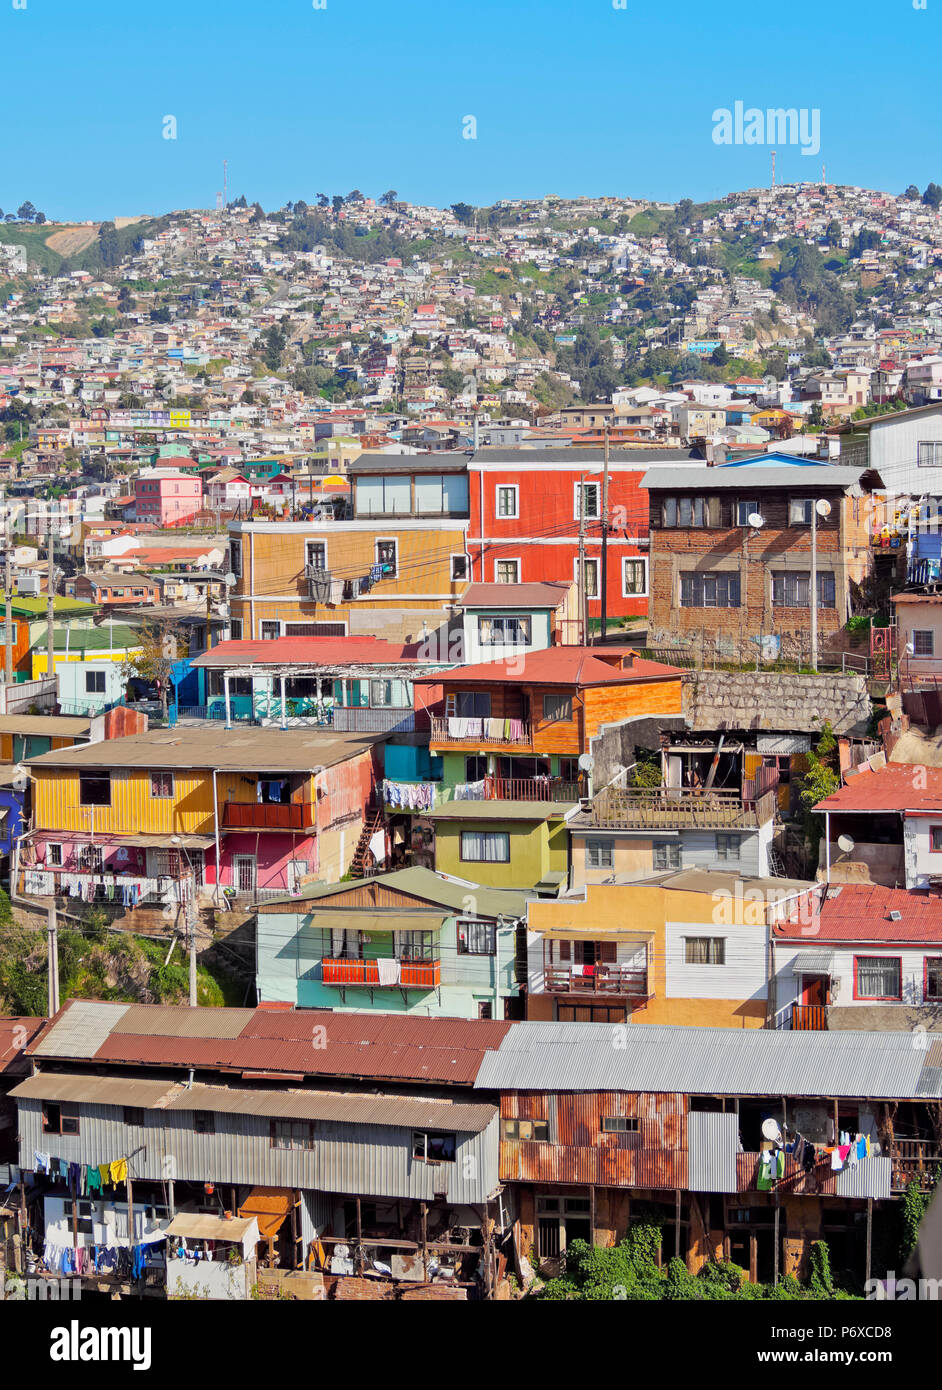 Chile, Cityscape of Valparaiso. - Stock Image